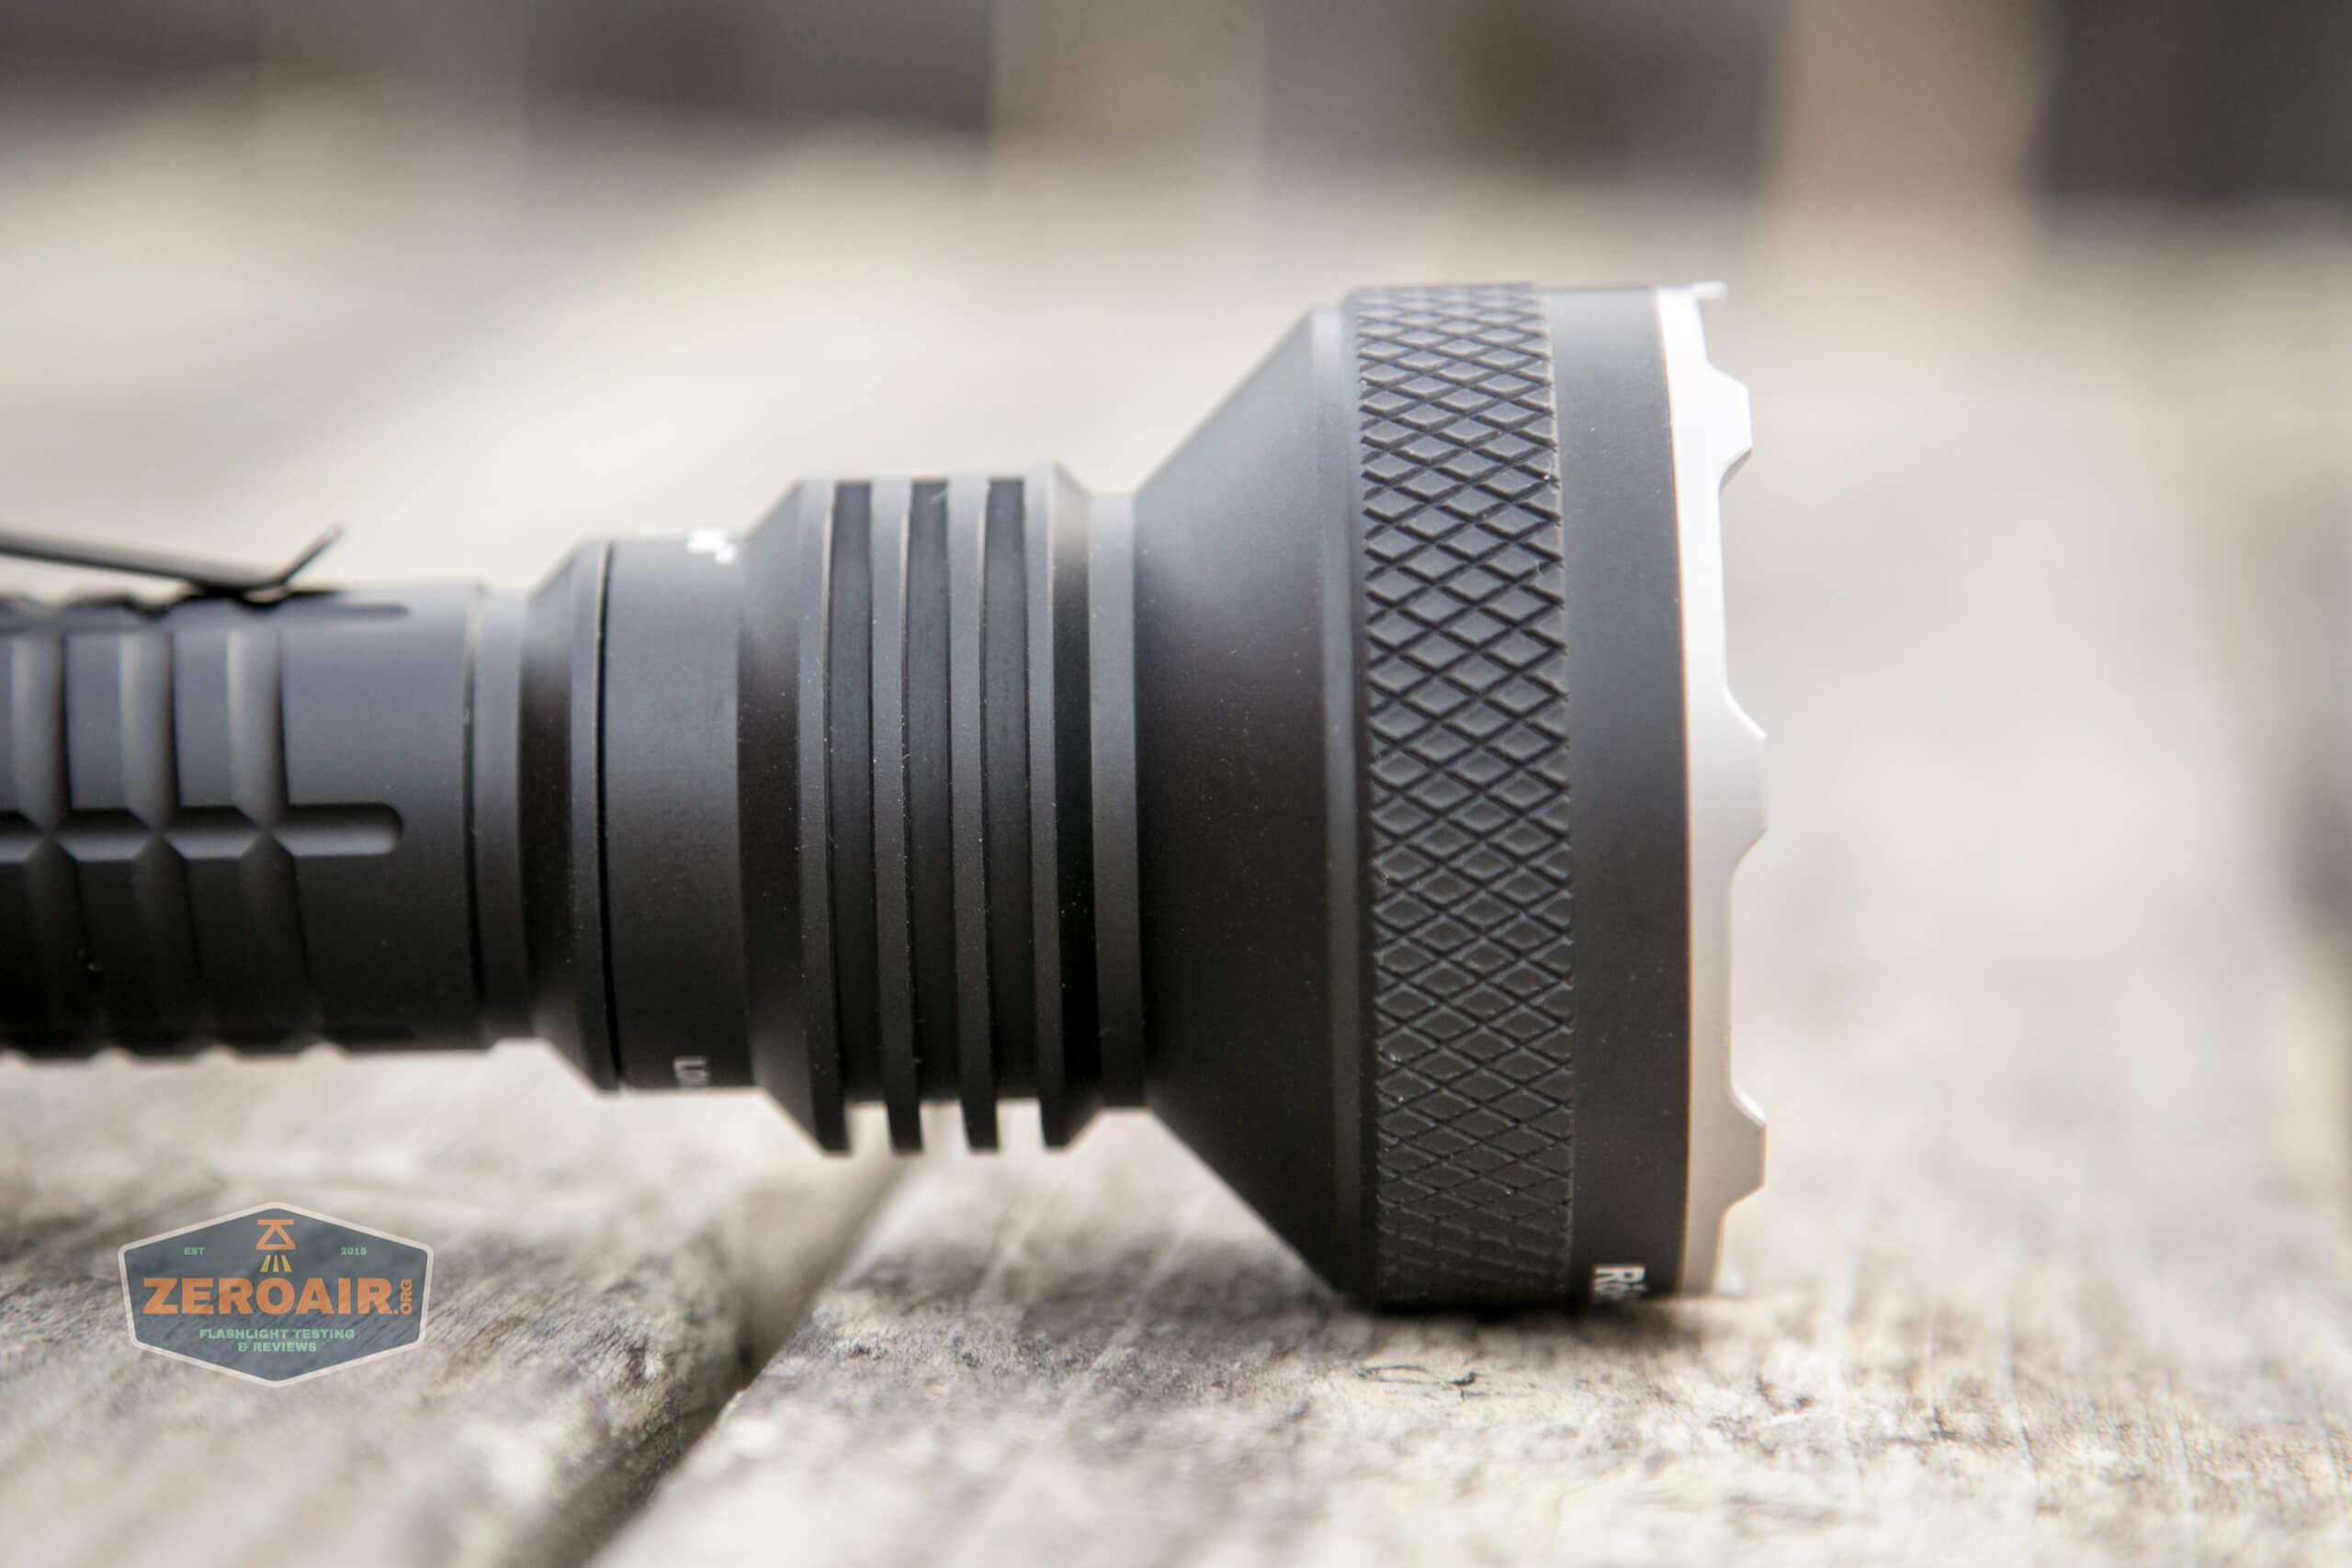 acebeam l35 flashlight head knurling side view